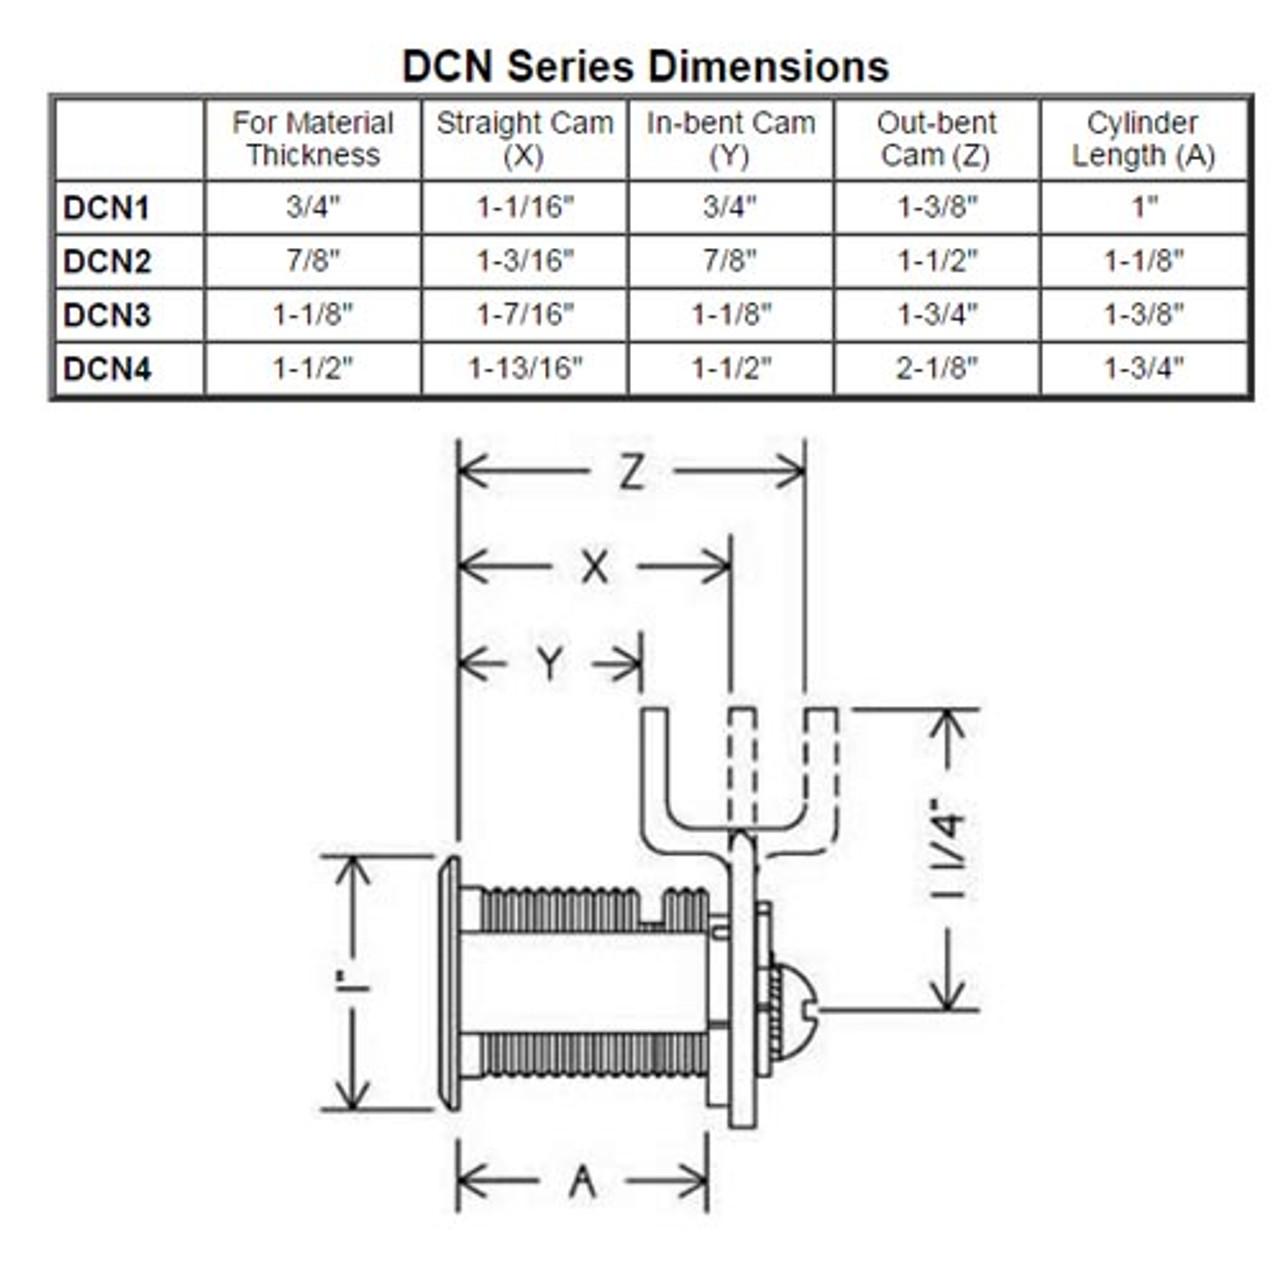 Olympus DCN3-KA107-26D N Series Keyed Alike Reversible Cam Lock in Satin Chrome